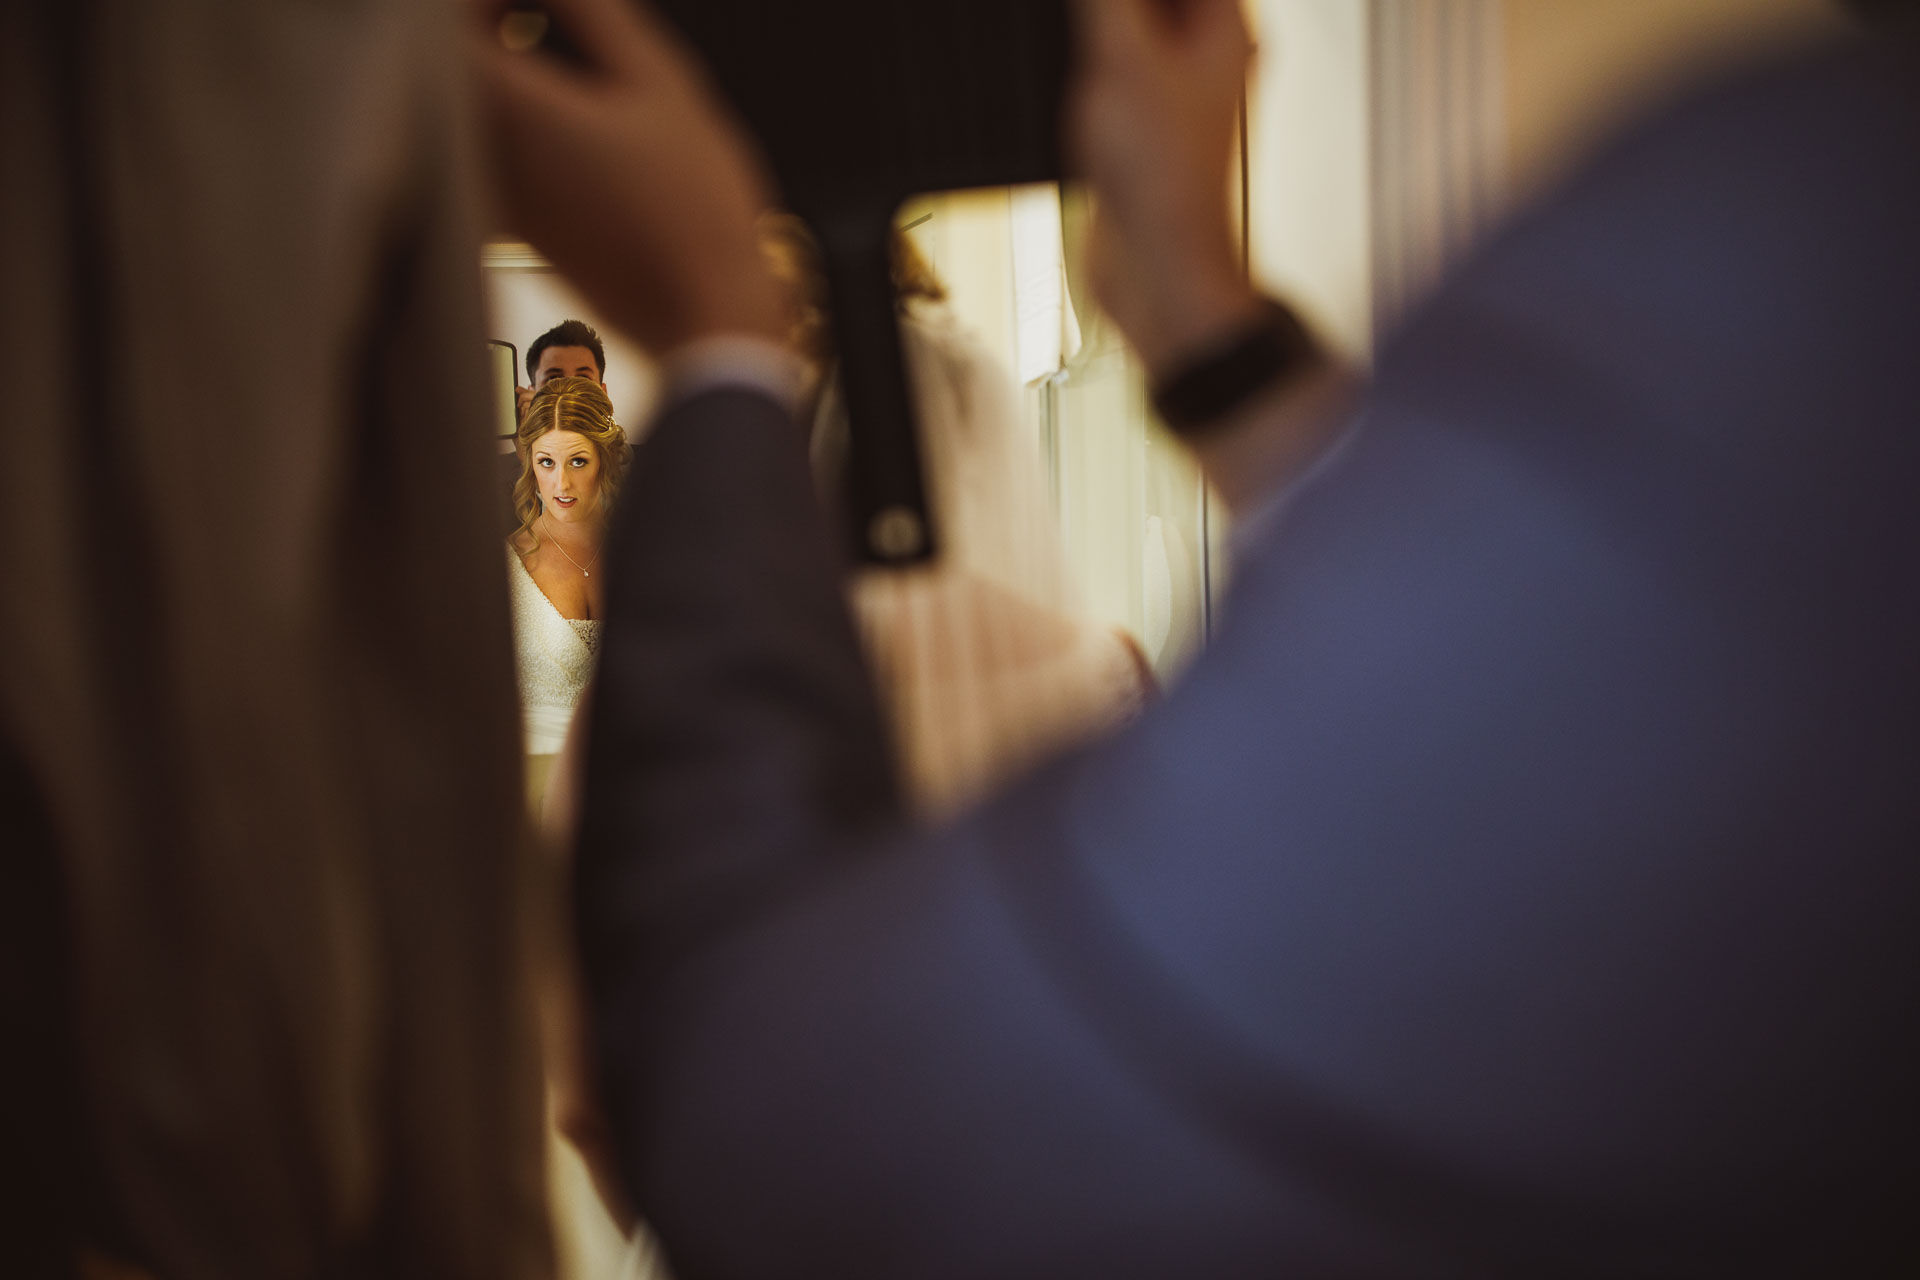 forbidden_corner_tupgill_estate_wedding_photographer-46.jpg